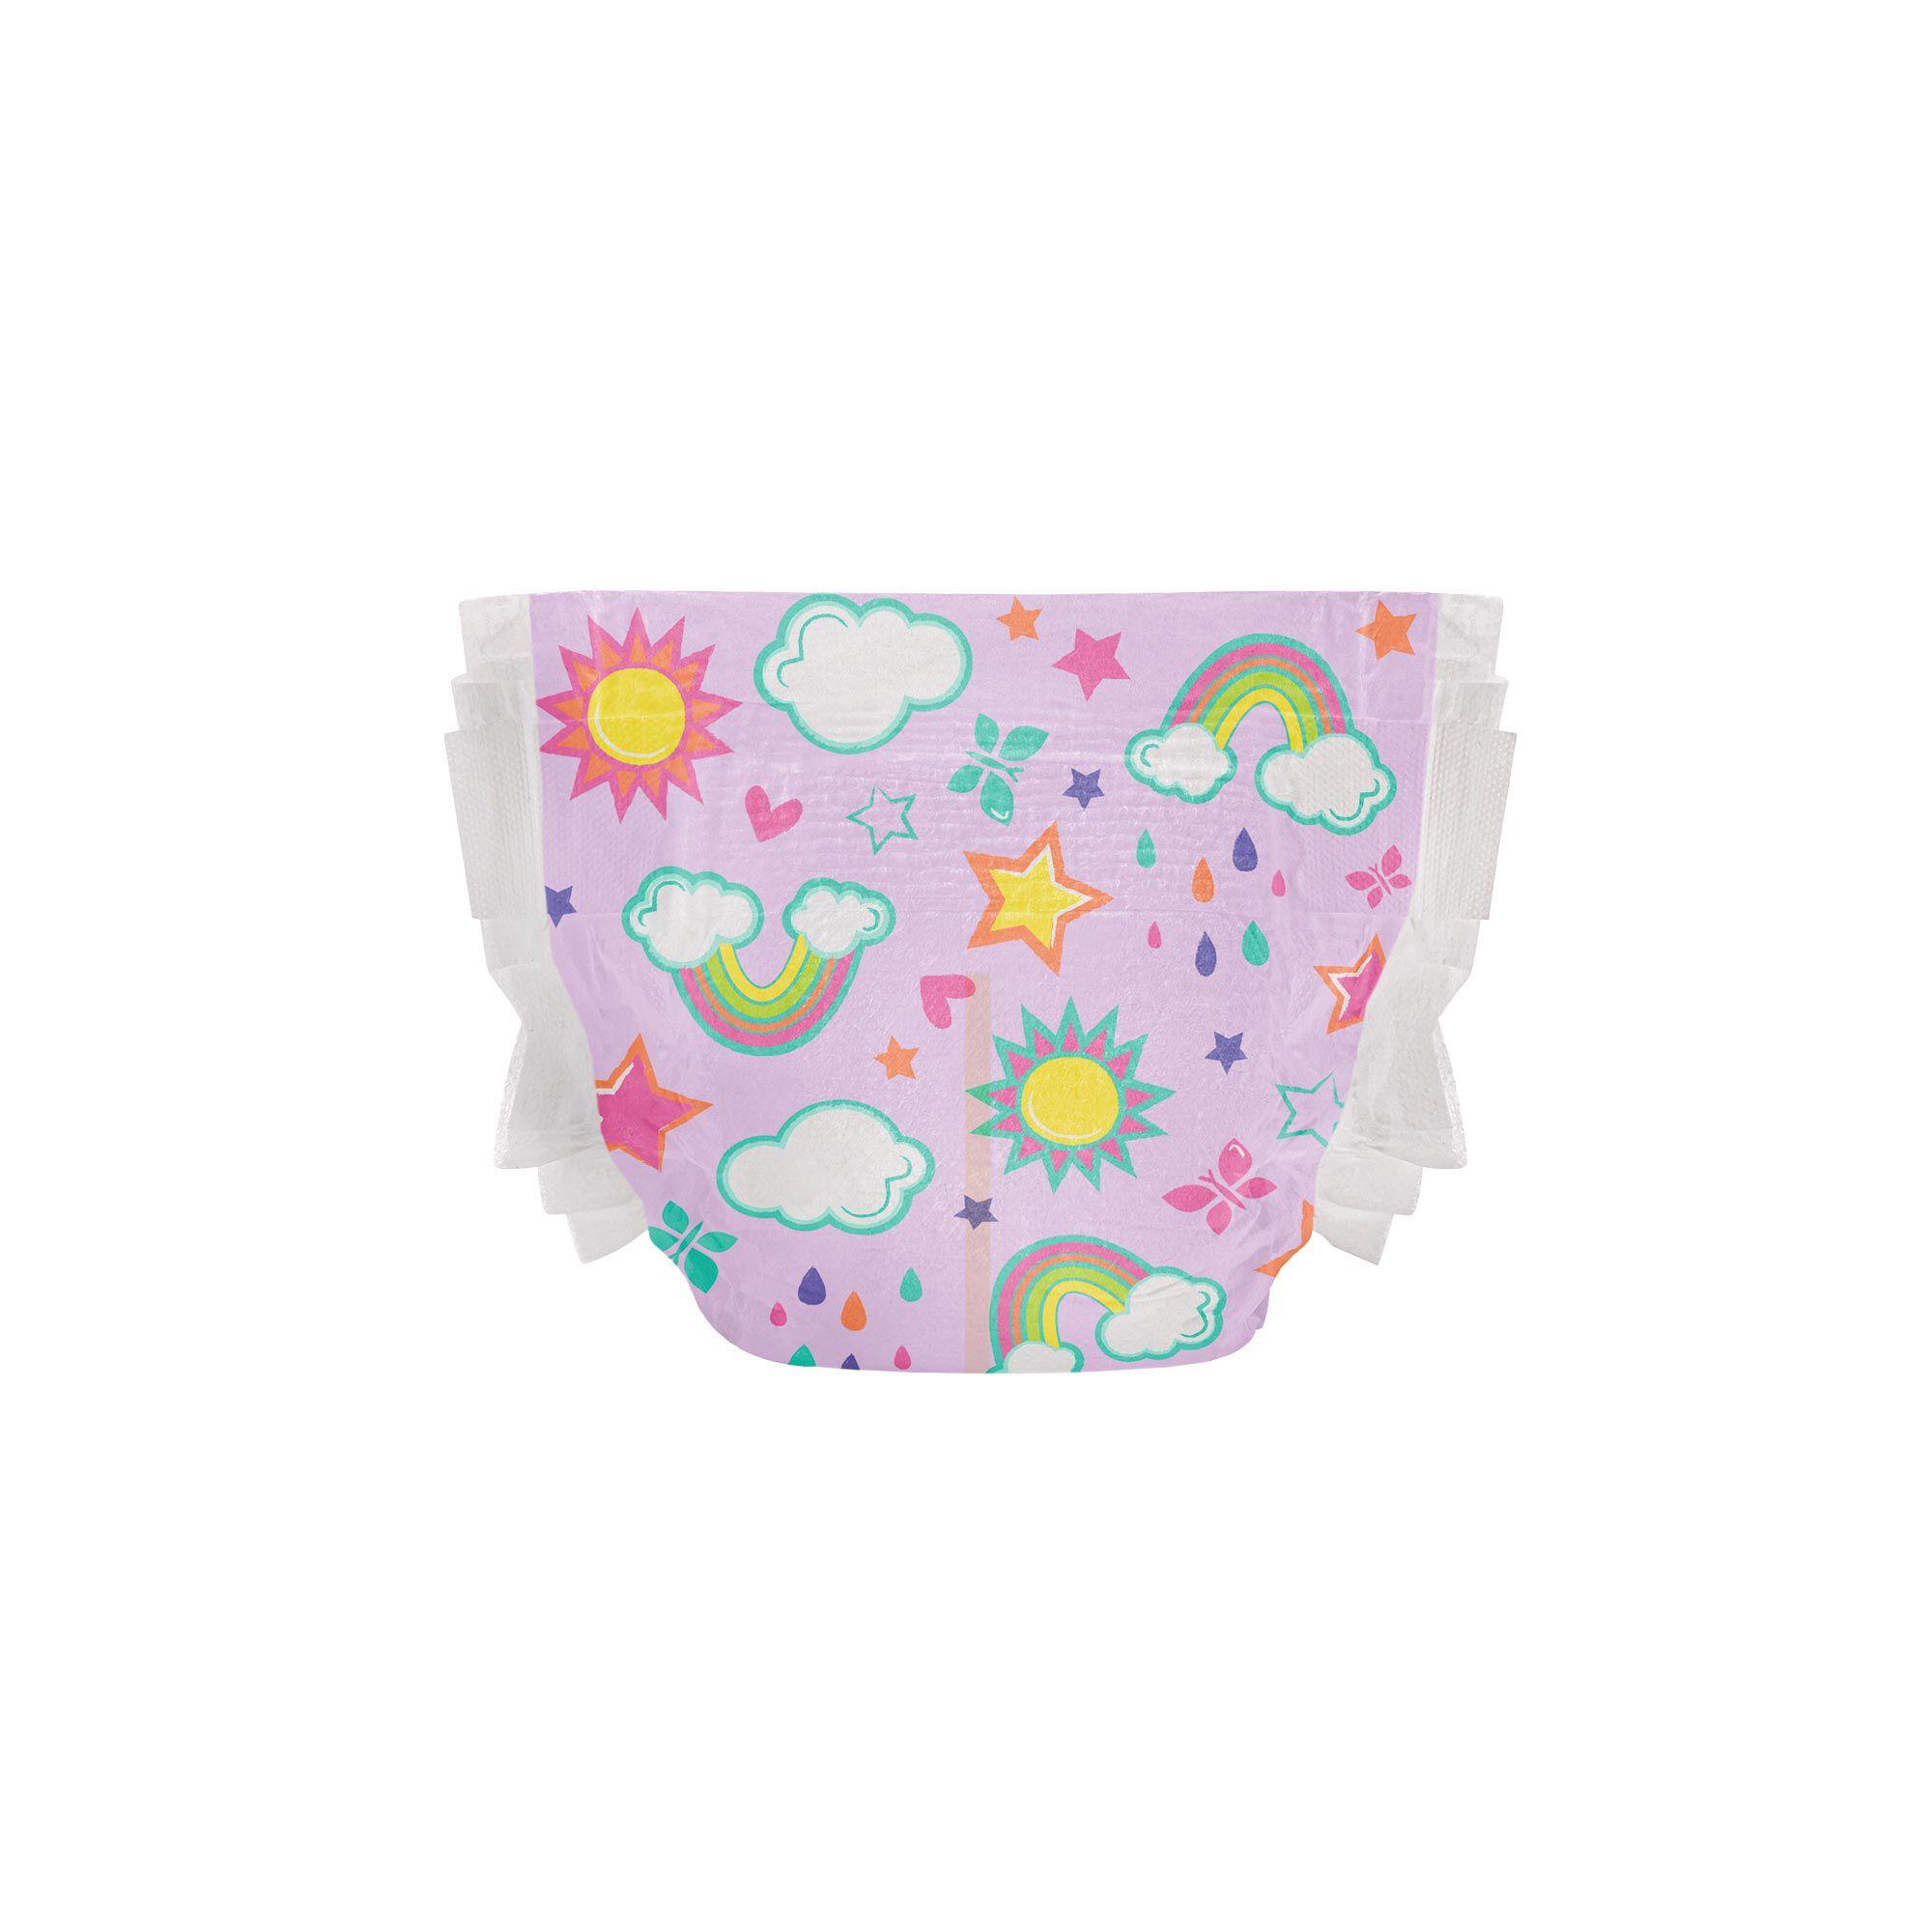 Clean Conscious Diaper, Skys the Limit, Size 5